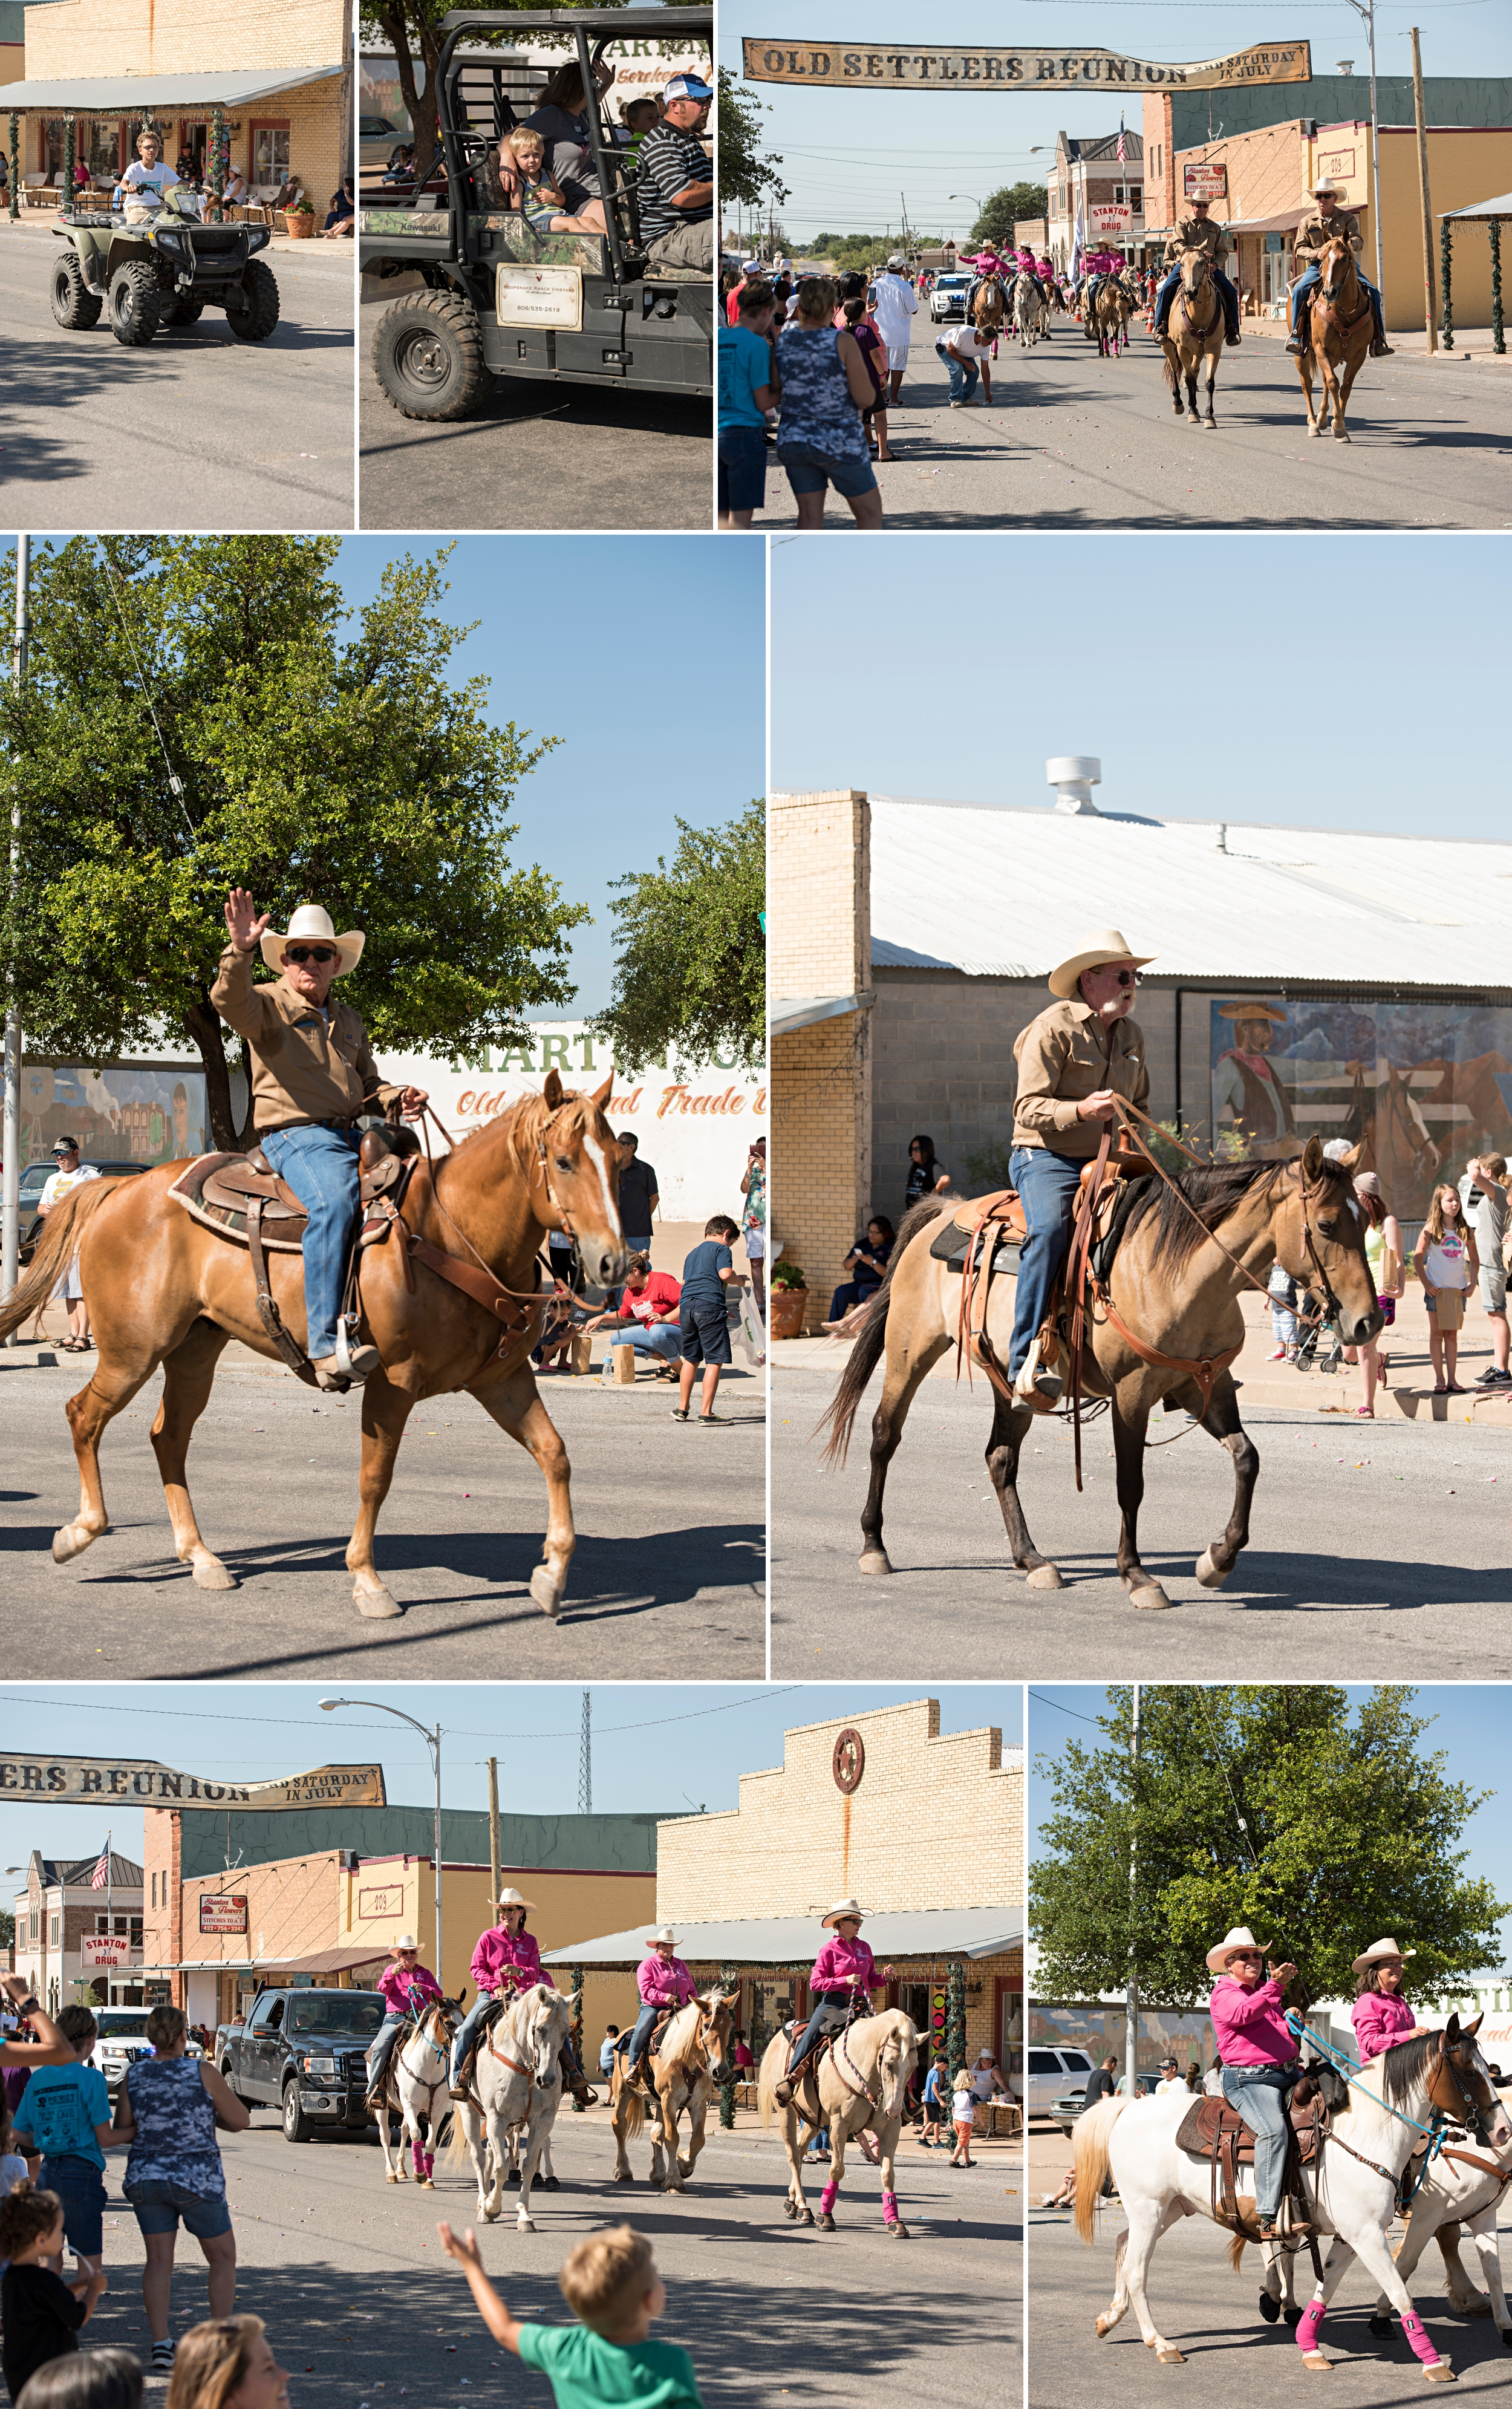 horsesinparade